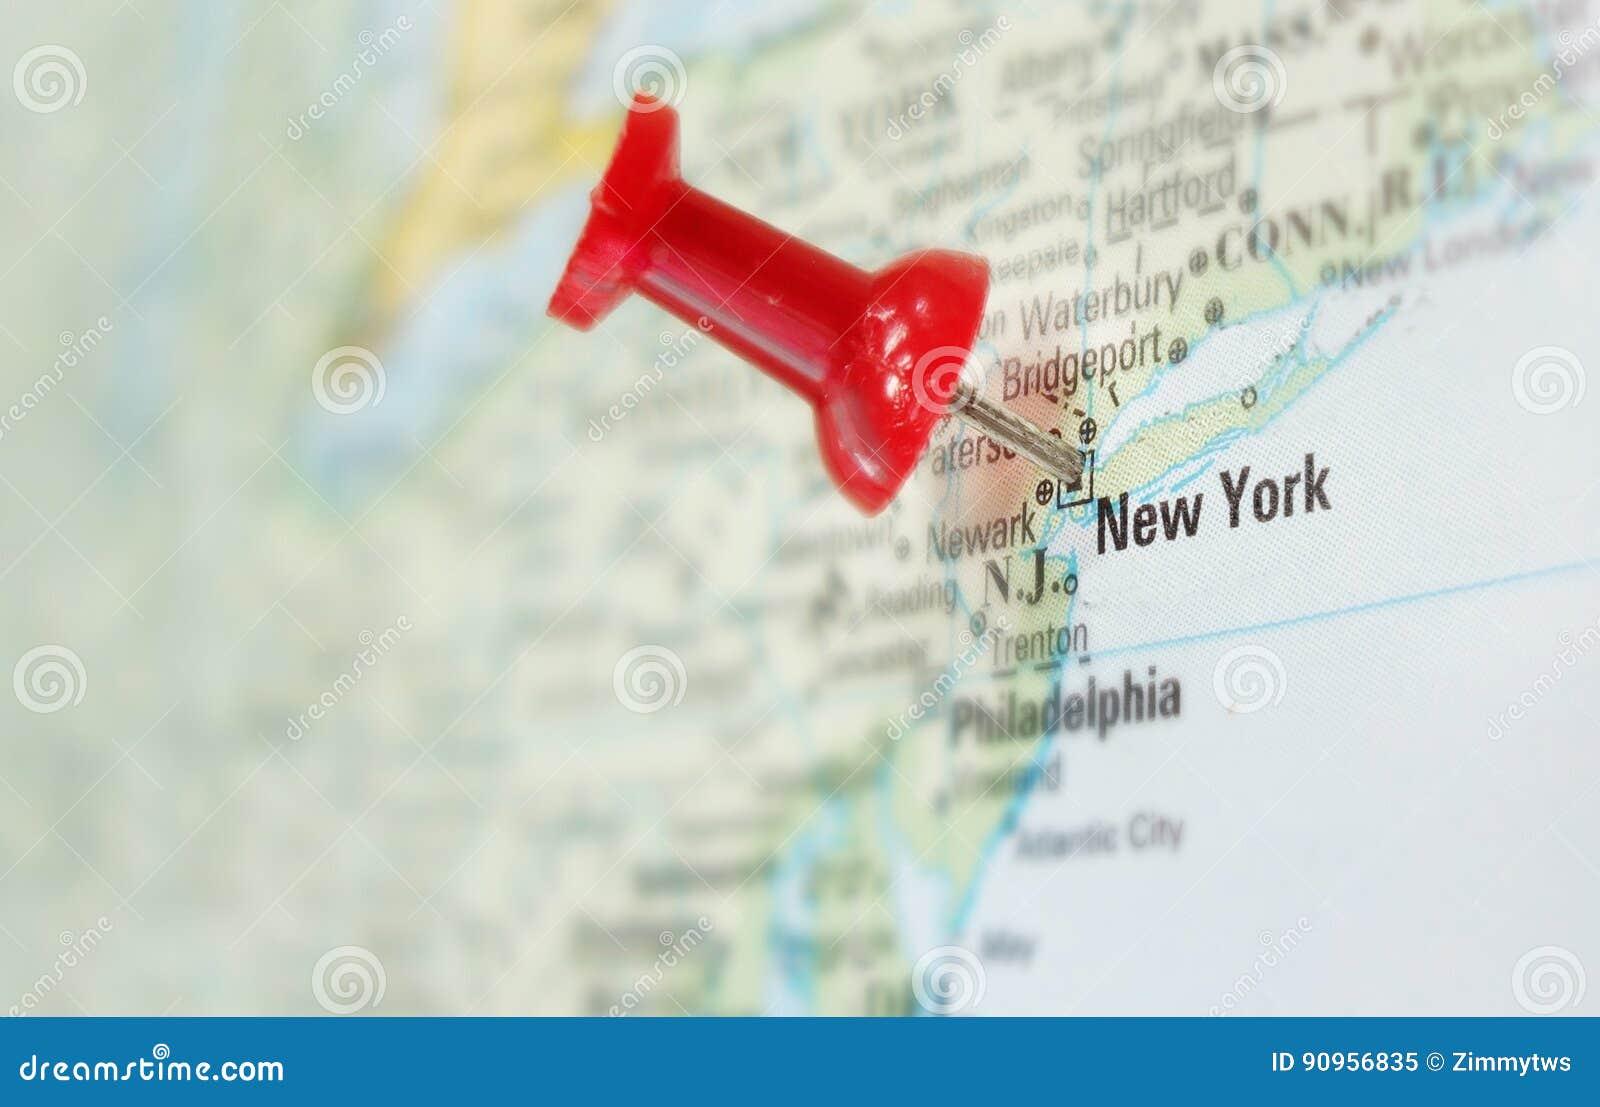 Cartina America New York.New York City Map Stock Image Image Of Tack Search 90956835